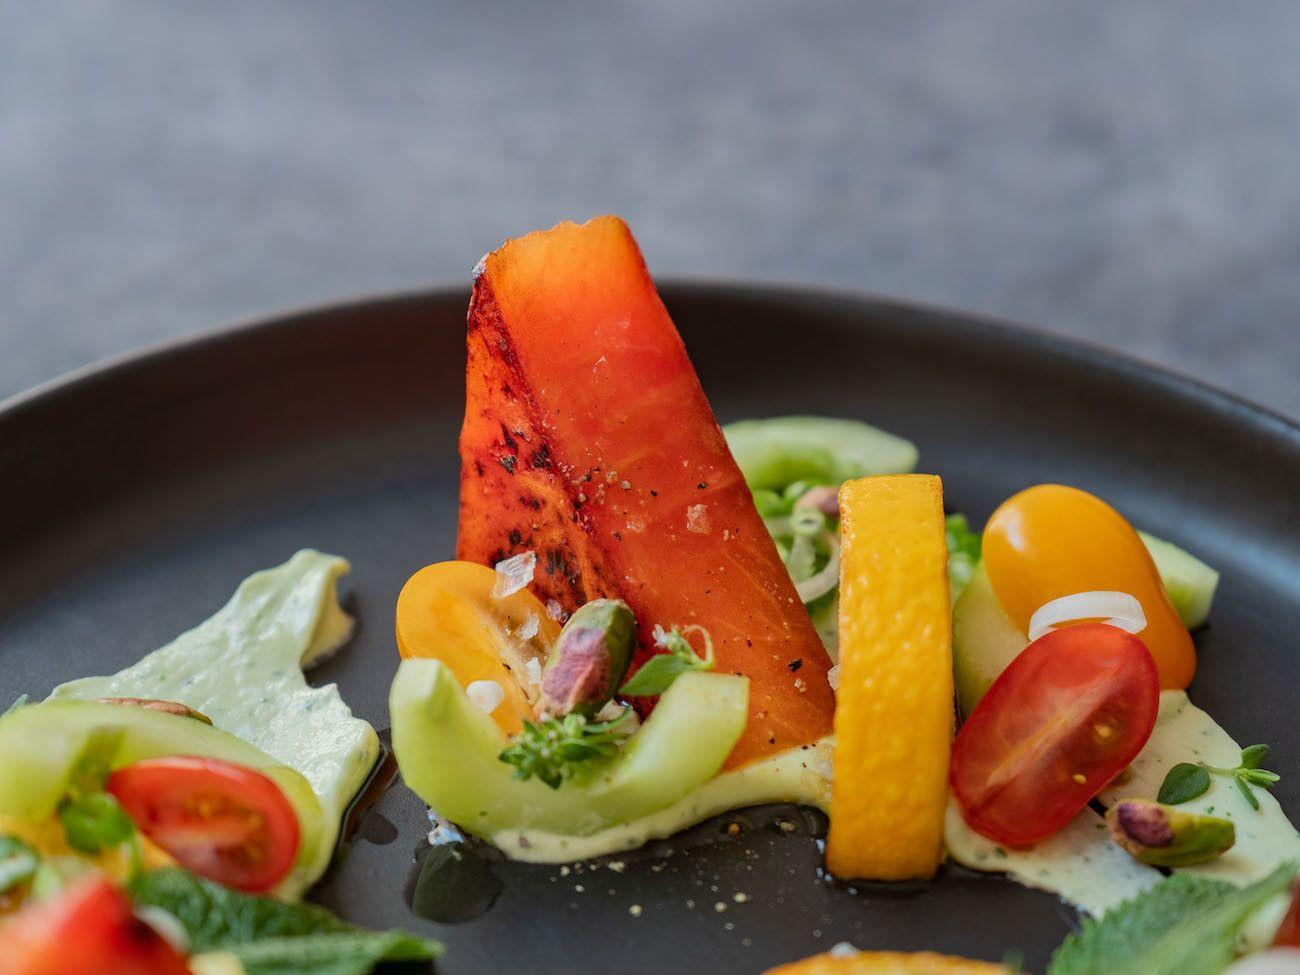 Foodblog, About Fuel, Rezept, Wassermelonensalat auf Basilikum-Feta-Creme, Pistazie, Minze, Gurke, Tomaten, Thymian